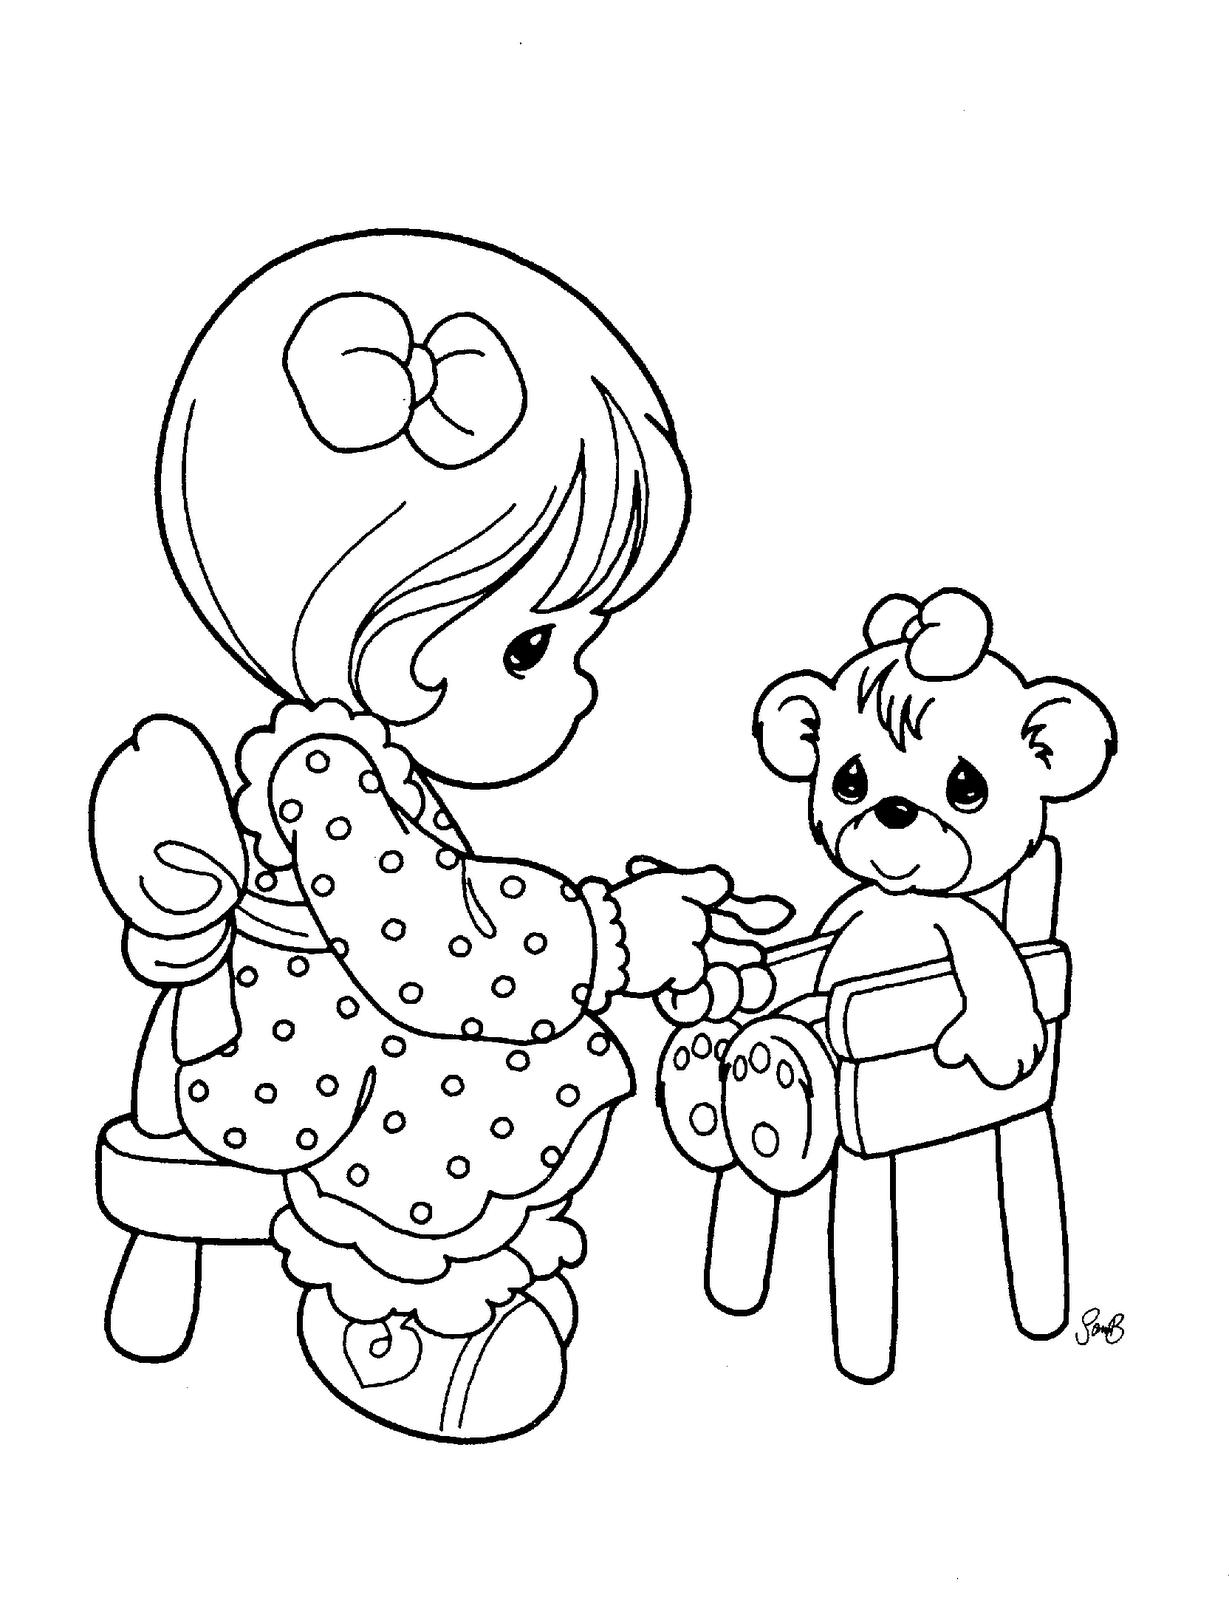 precious moments coloring pages precious moments kids coloring child coloring moments precious pages coloring